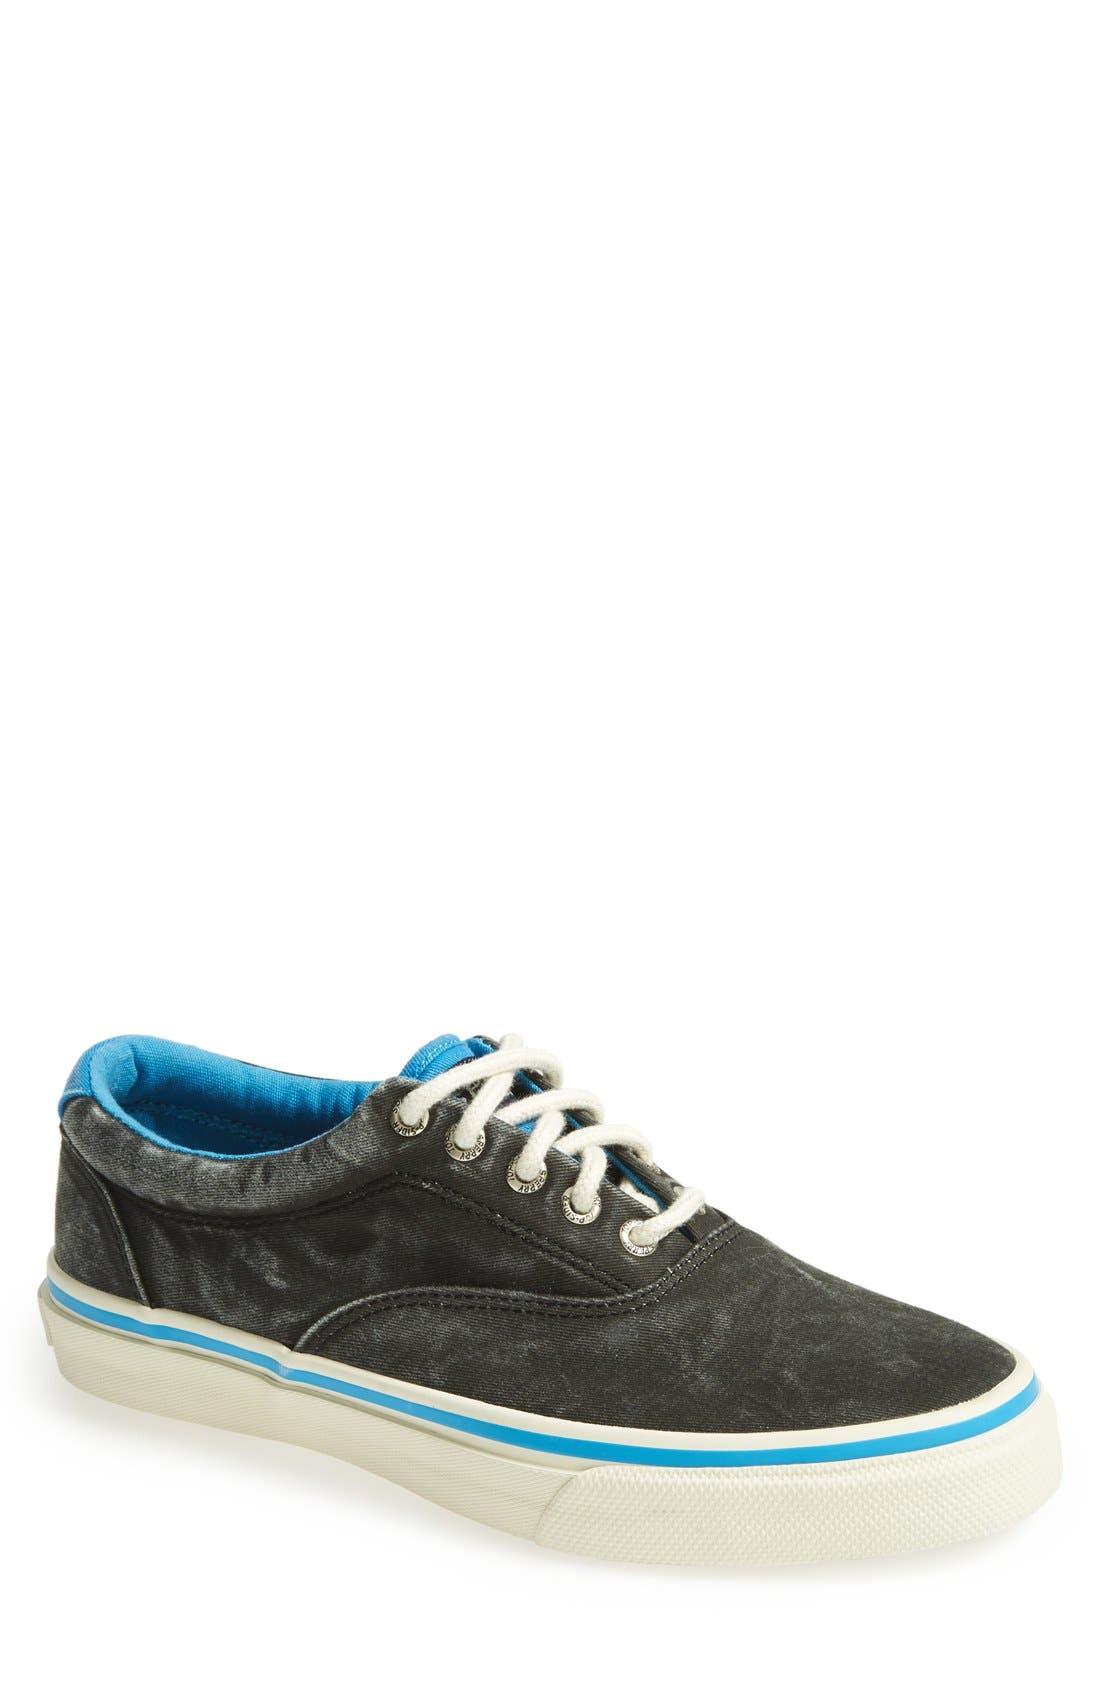 Main Image - Sperry Top-Sider® 'Striper CVO' Sneaker (Men)